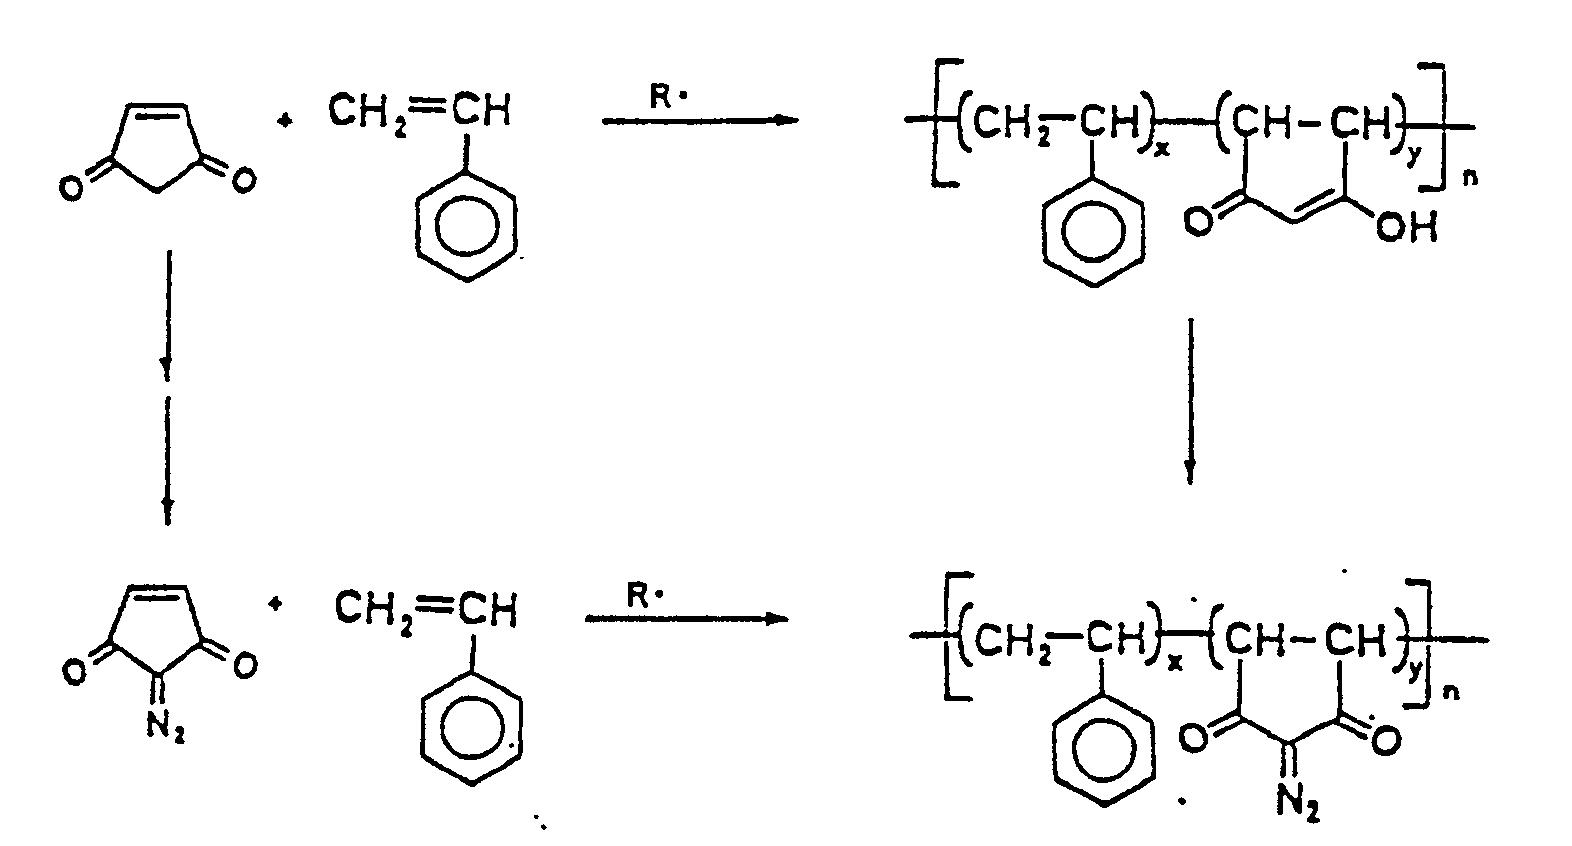 pin the structural formula of tetrachlorodibenzodioxin